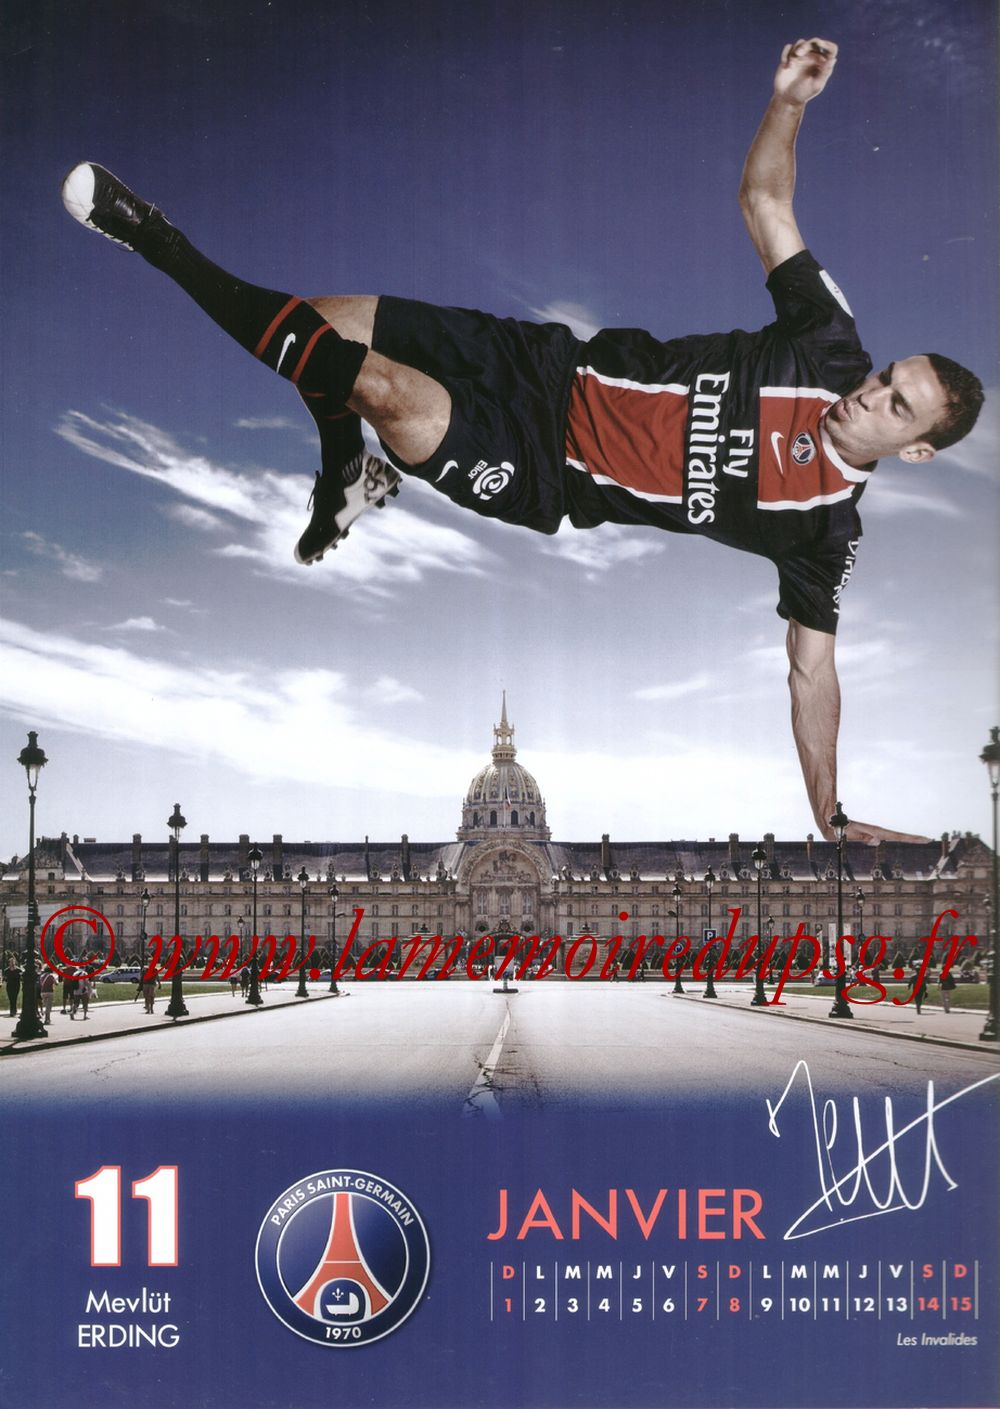 Calendrier PSG 2012 - Page 01 - Mevlut ERDING